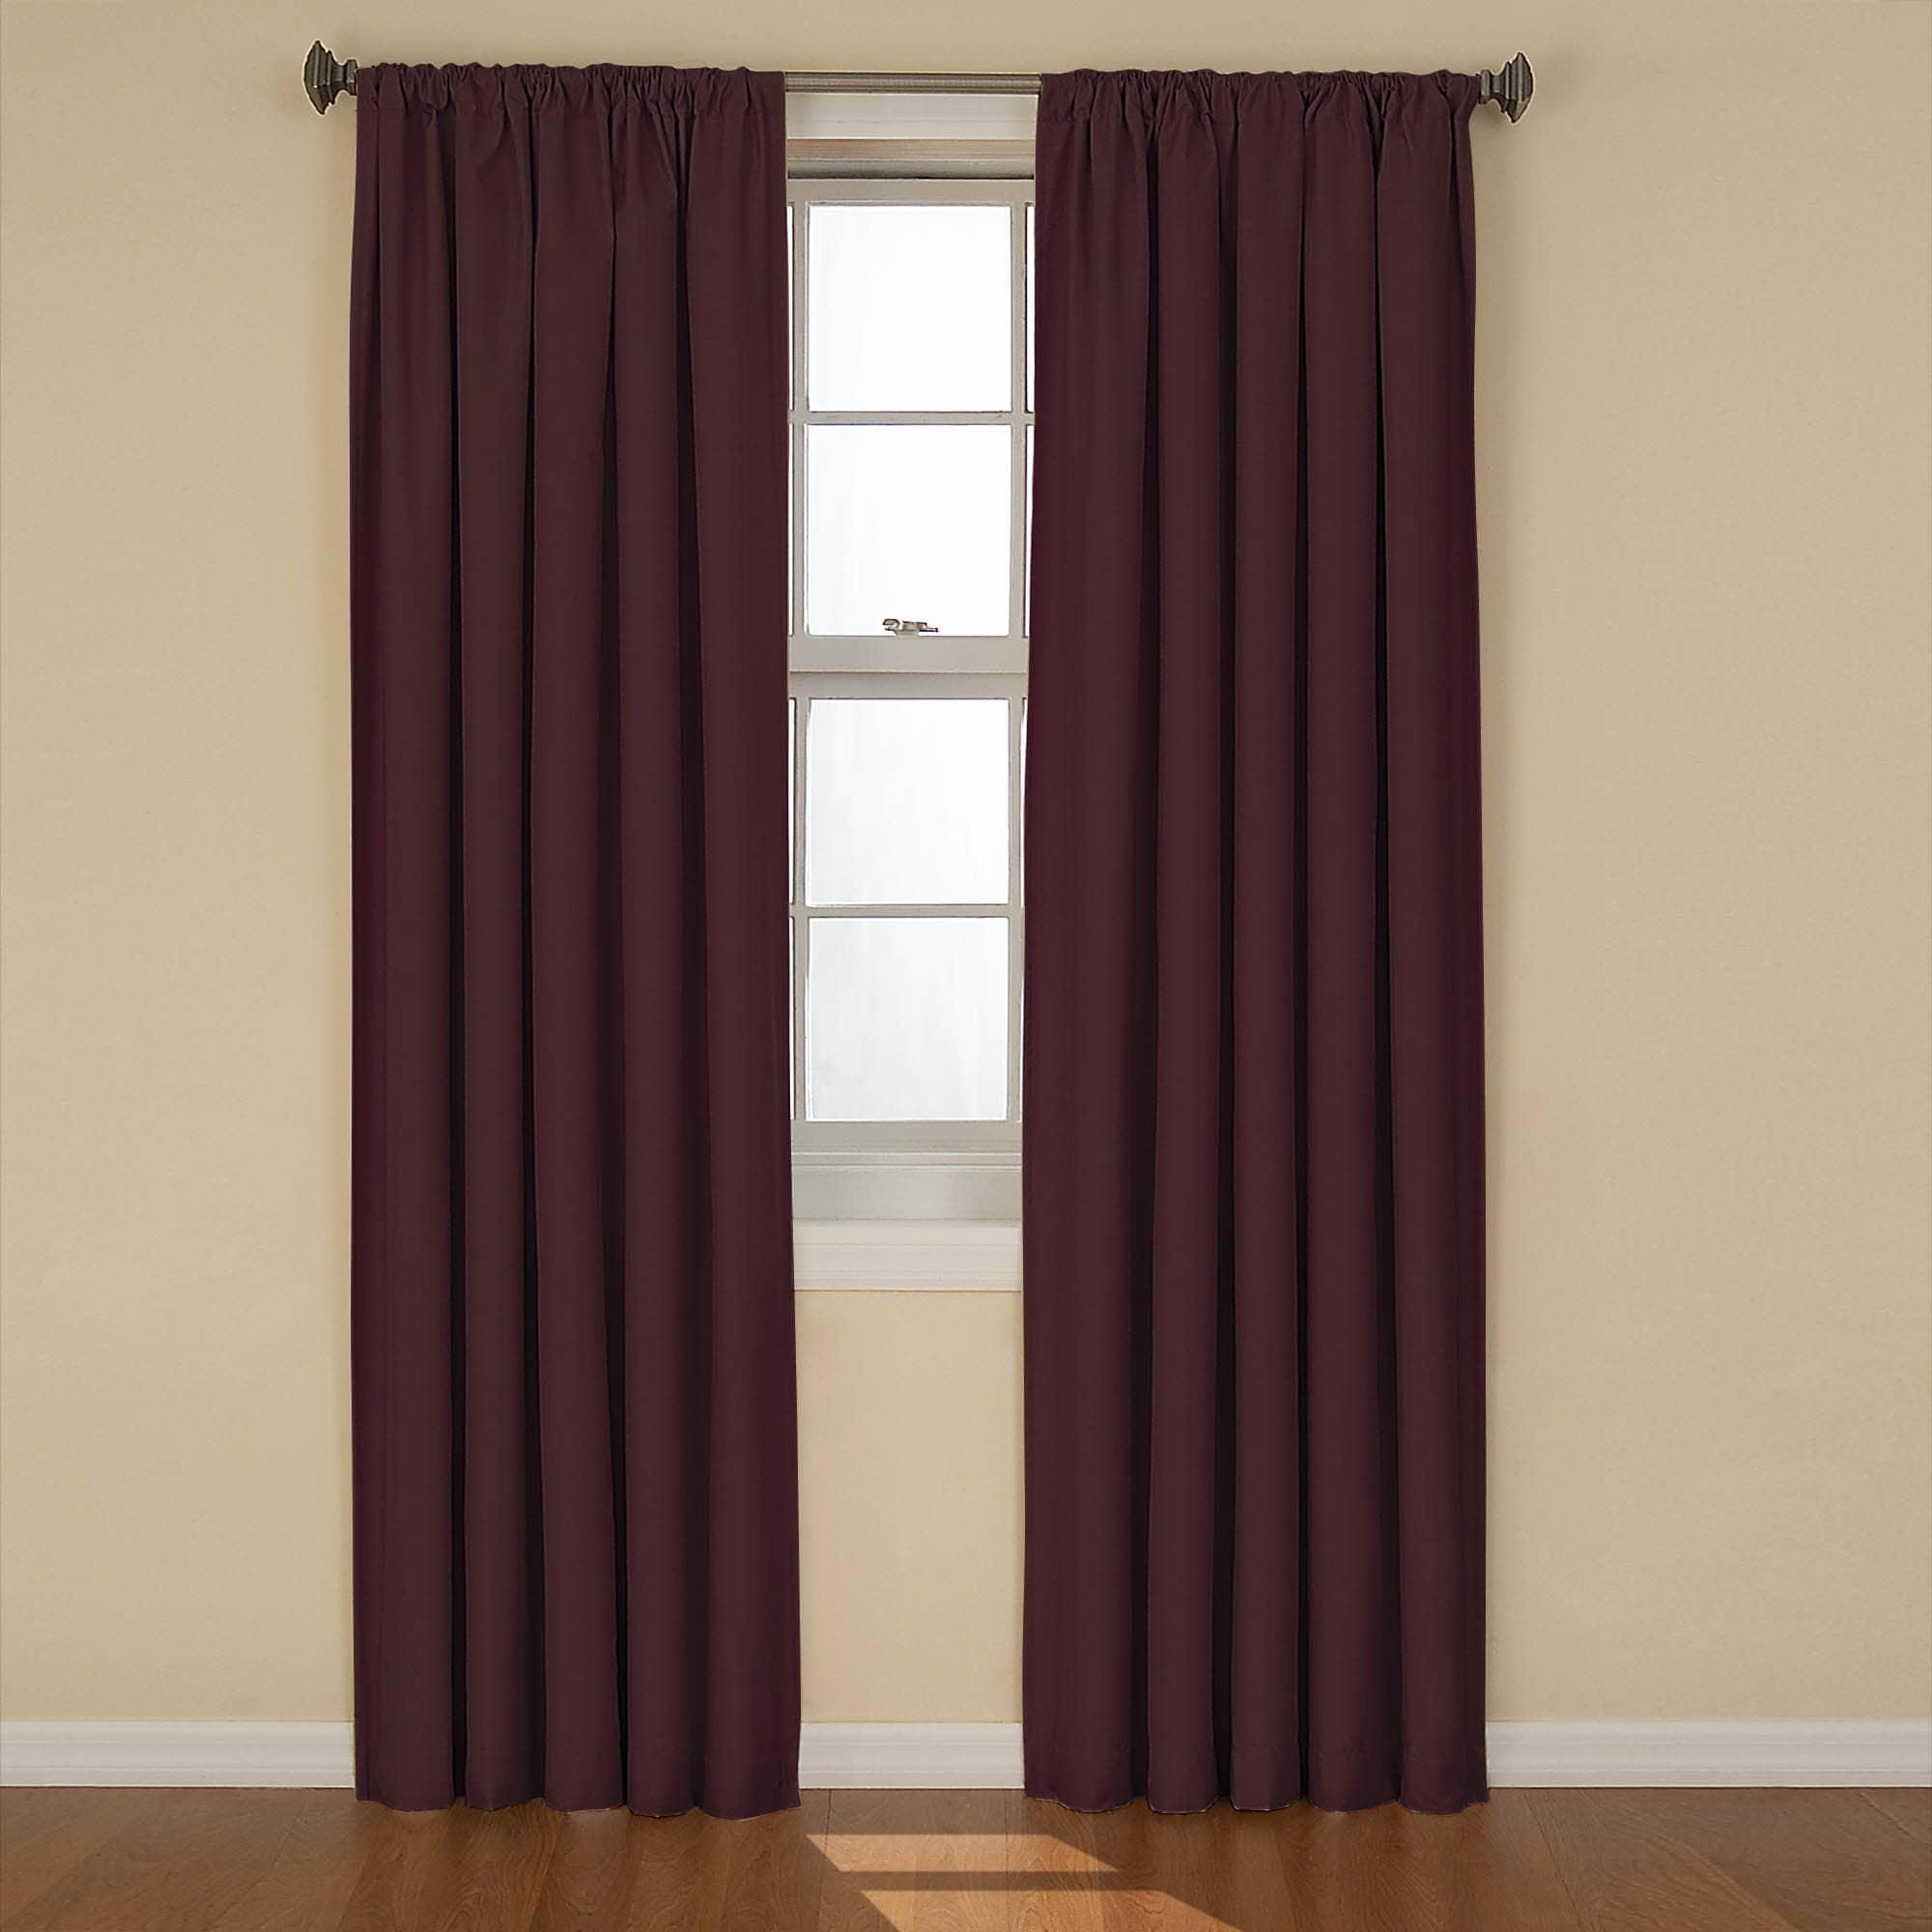 Blackout curtain target